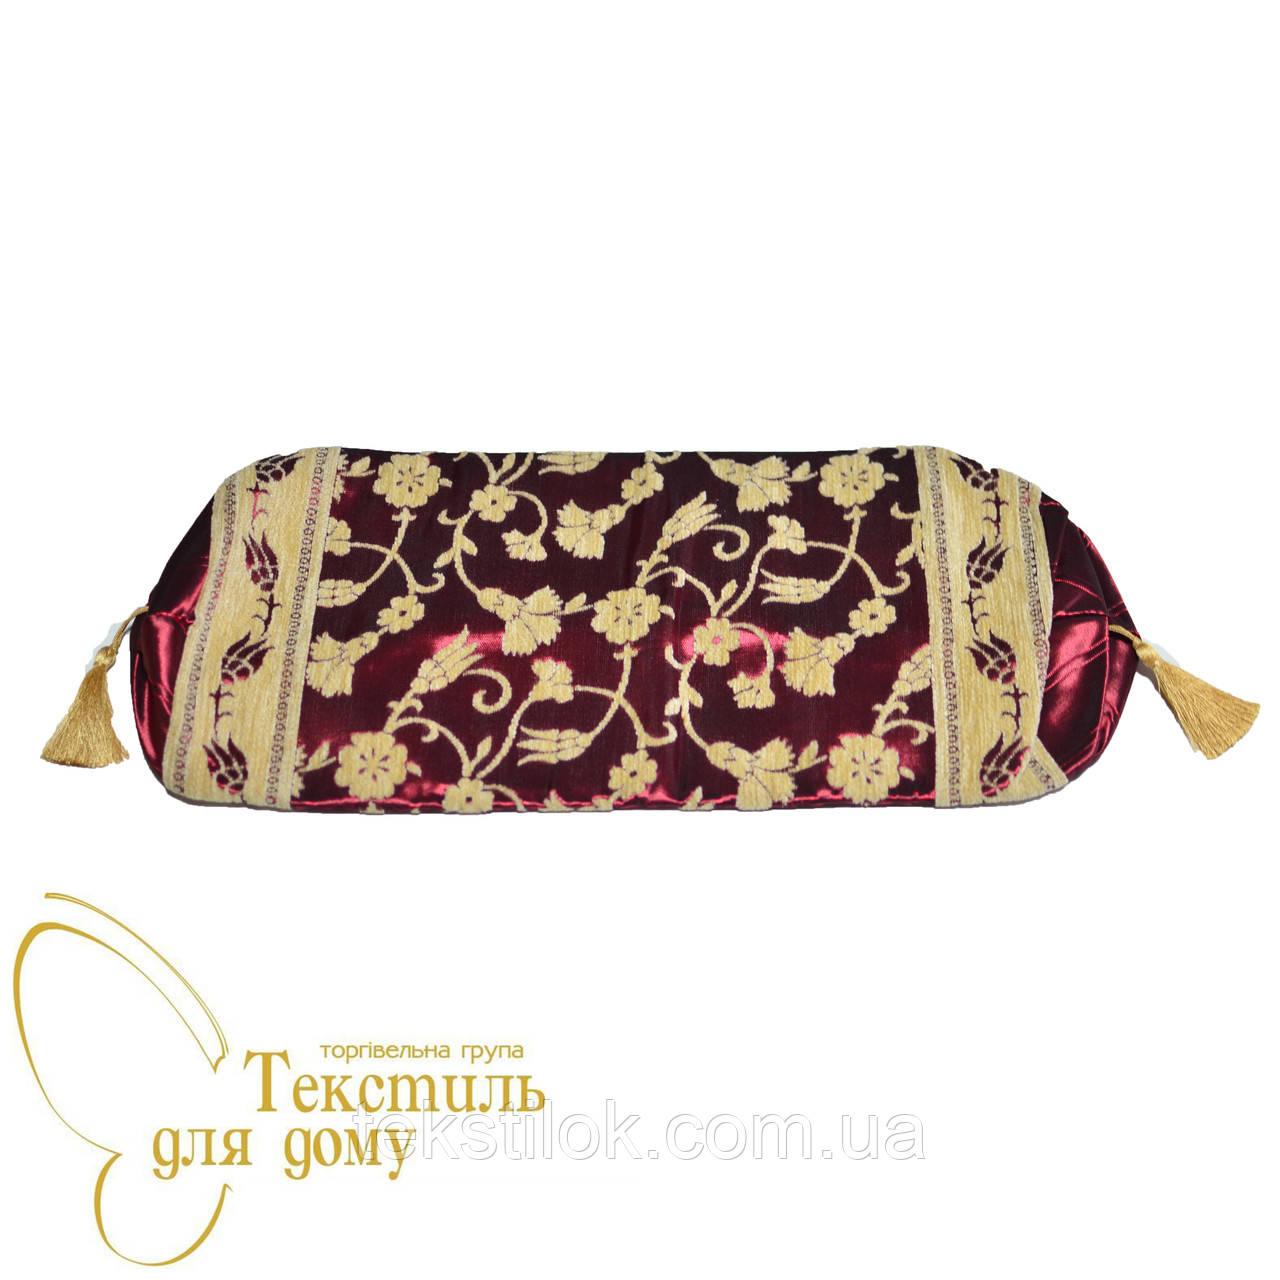 Наволочка декоративная валик, велюр рисунок по шелку, бордо